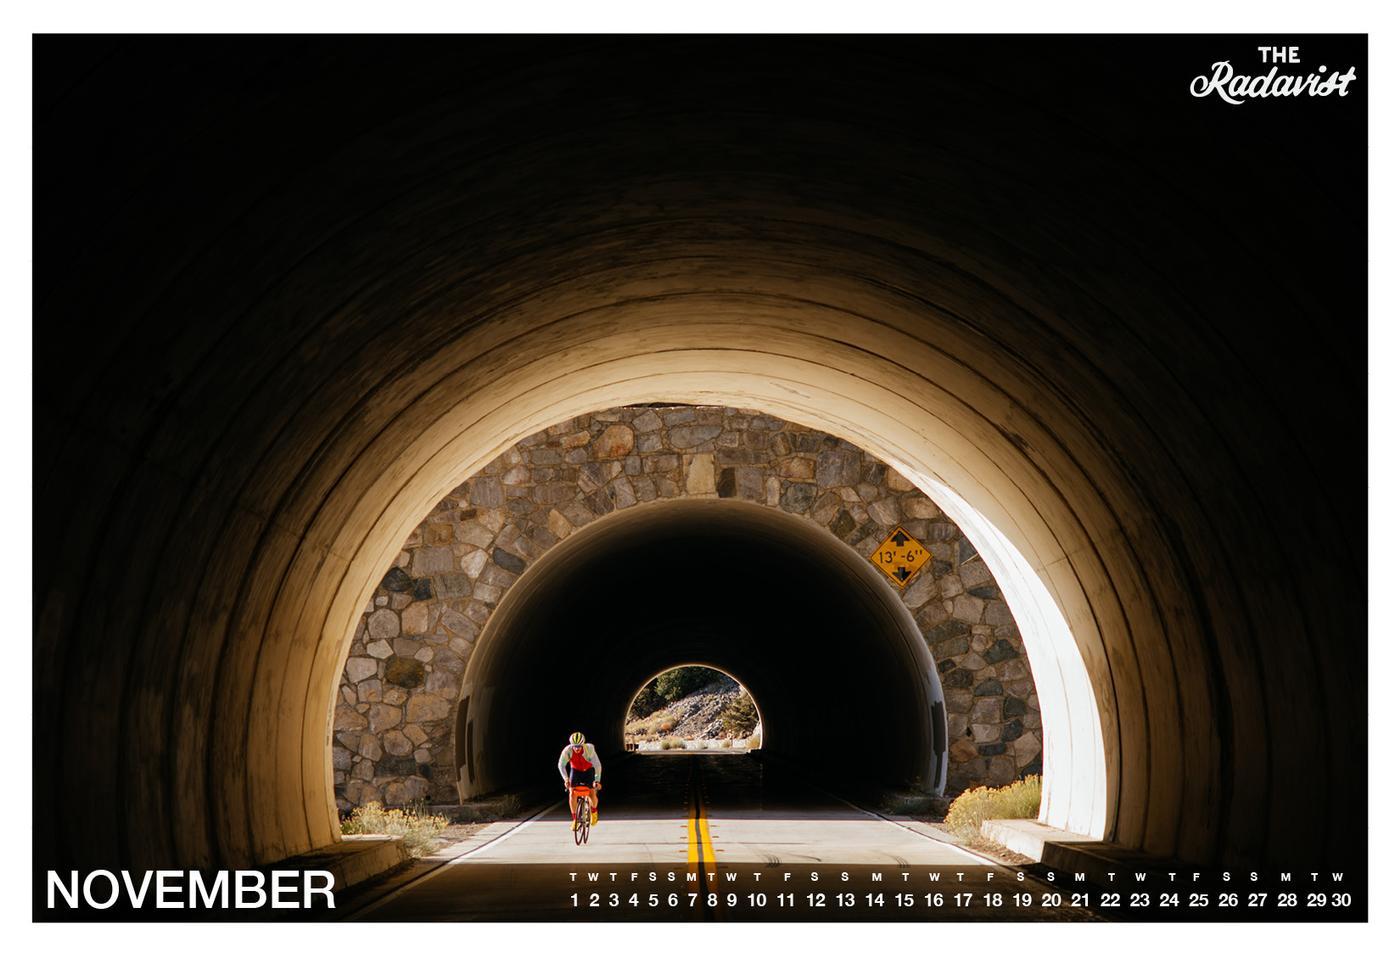 The Radavist 2016 Calendar: November